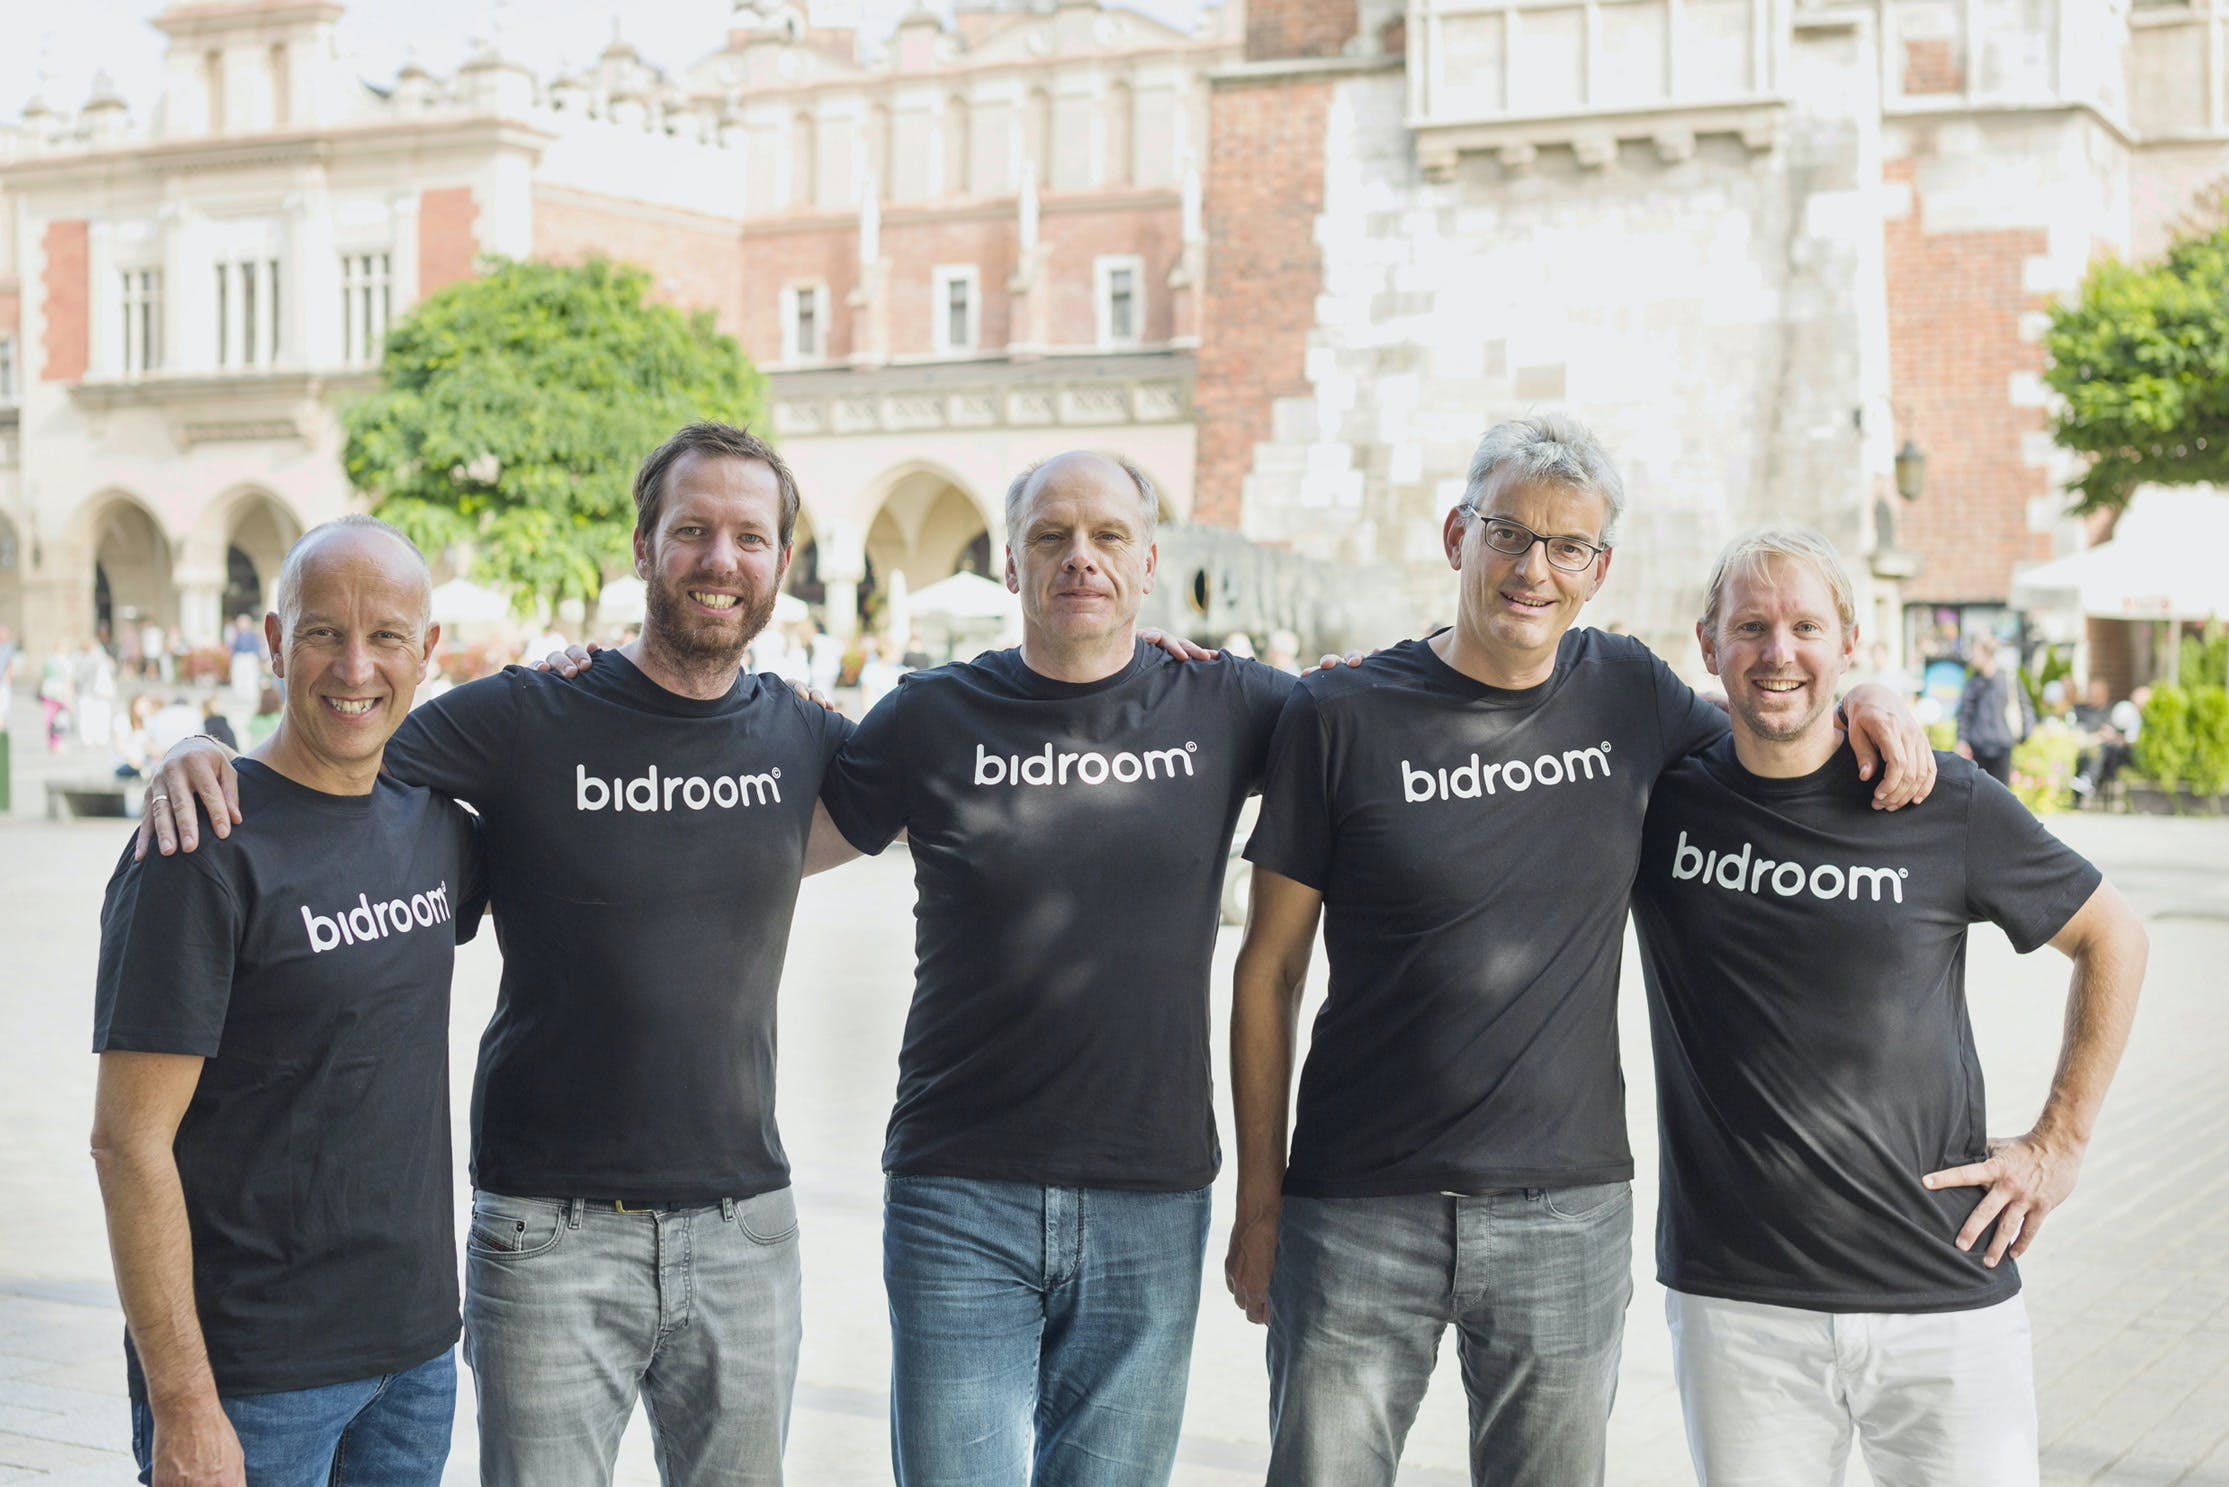 New Board Of Directors For Bidroom